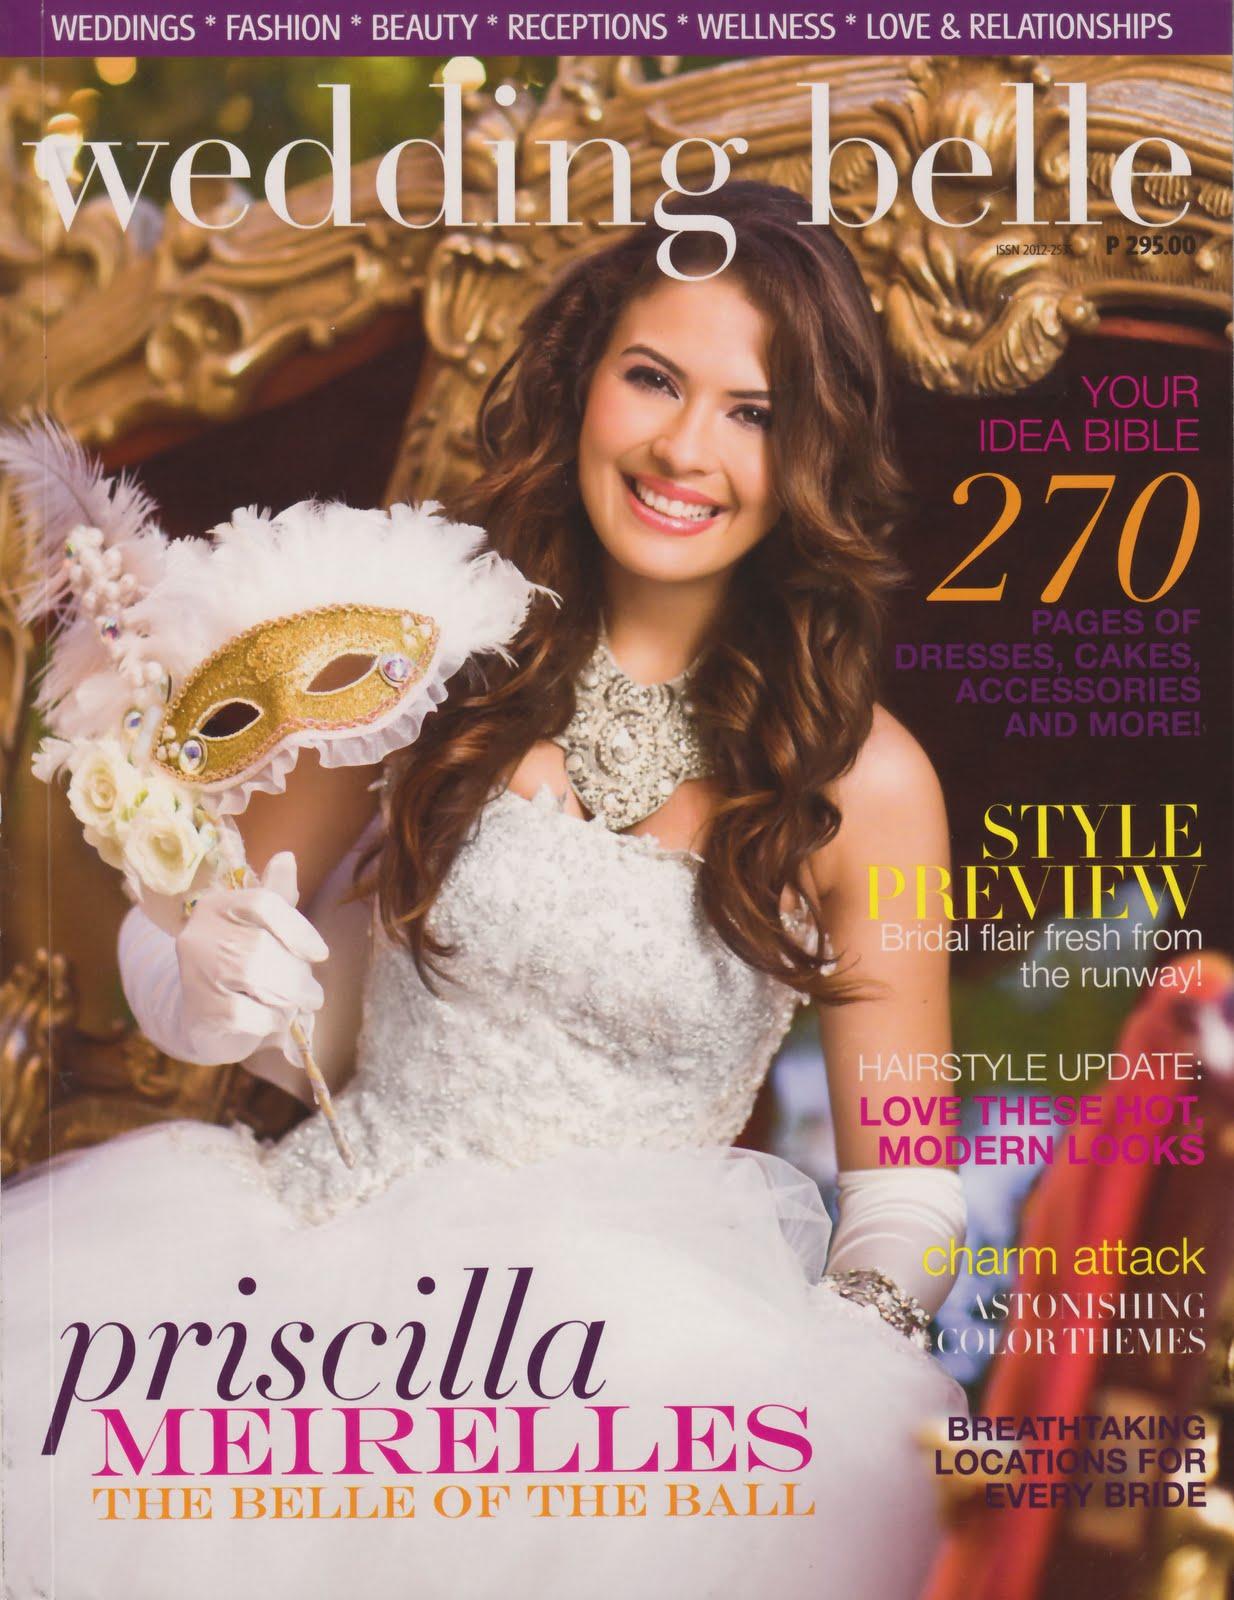 ⊰✿• .¸¸.⊰ Galeria de Priscilla Meirelles, Miss Earth 2004.⊰✿• .¸¸.⊰  - Página 3 Wedding%2BBelle%2B(Oct%2B2009)%2B